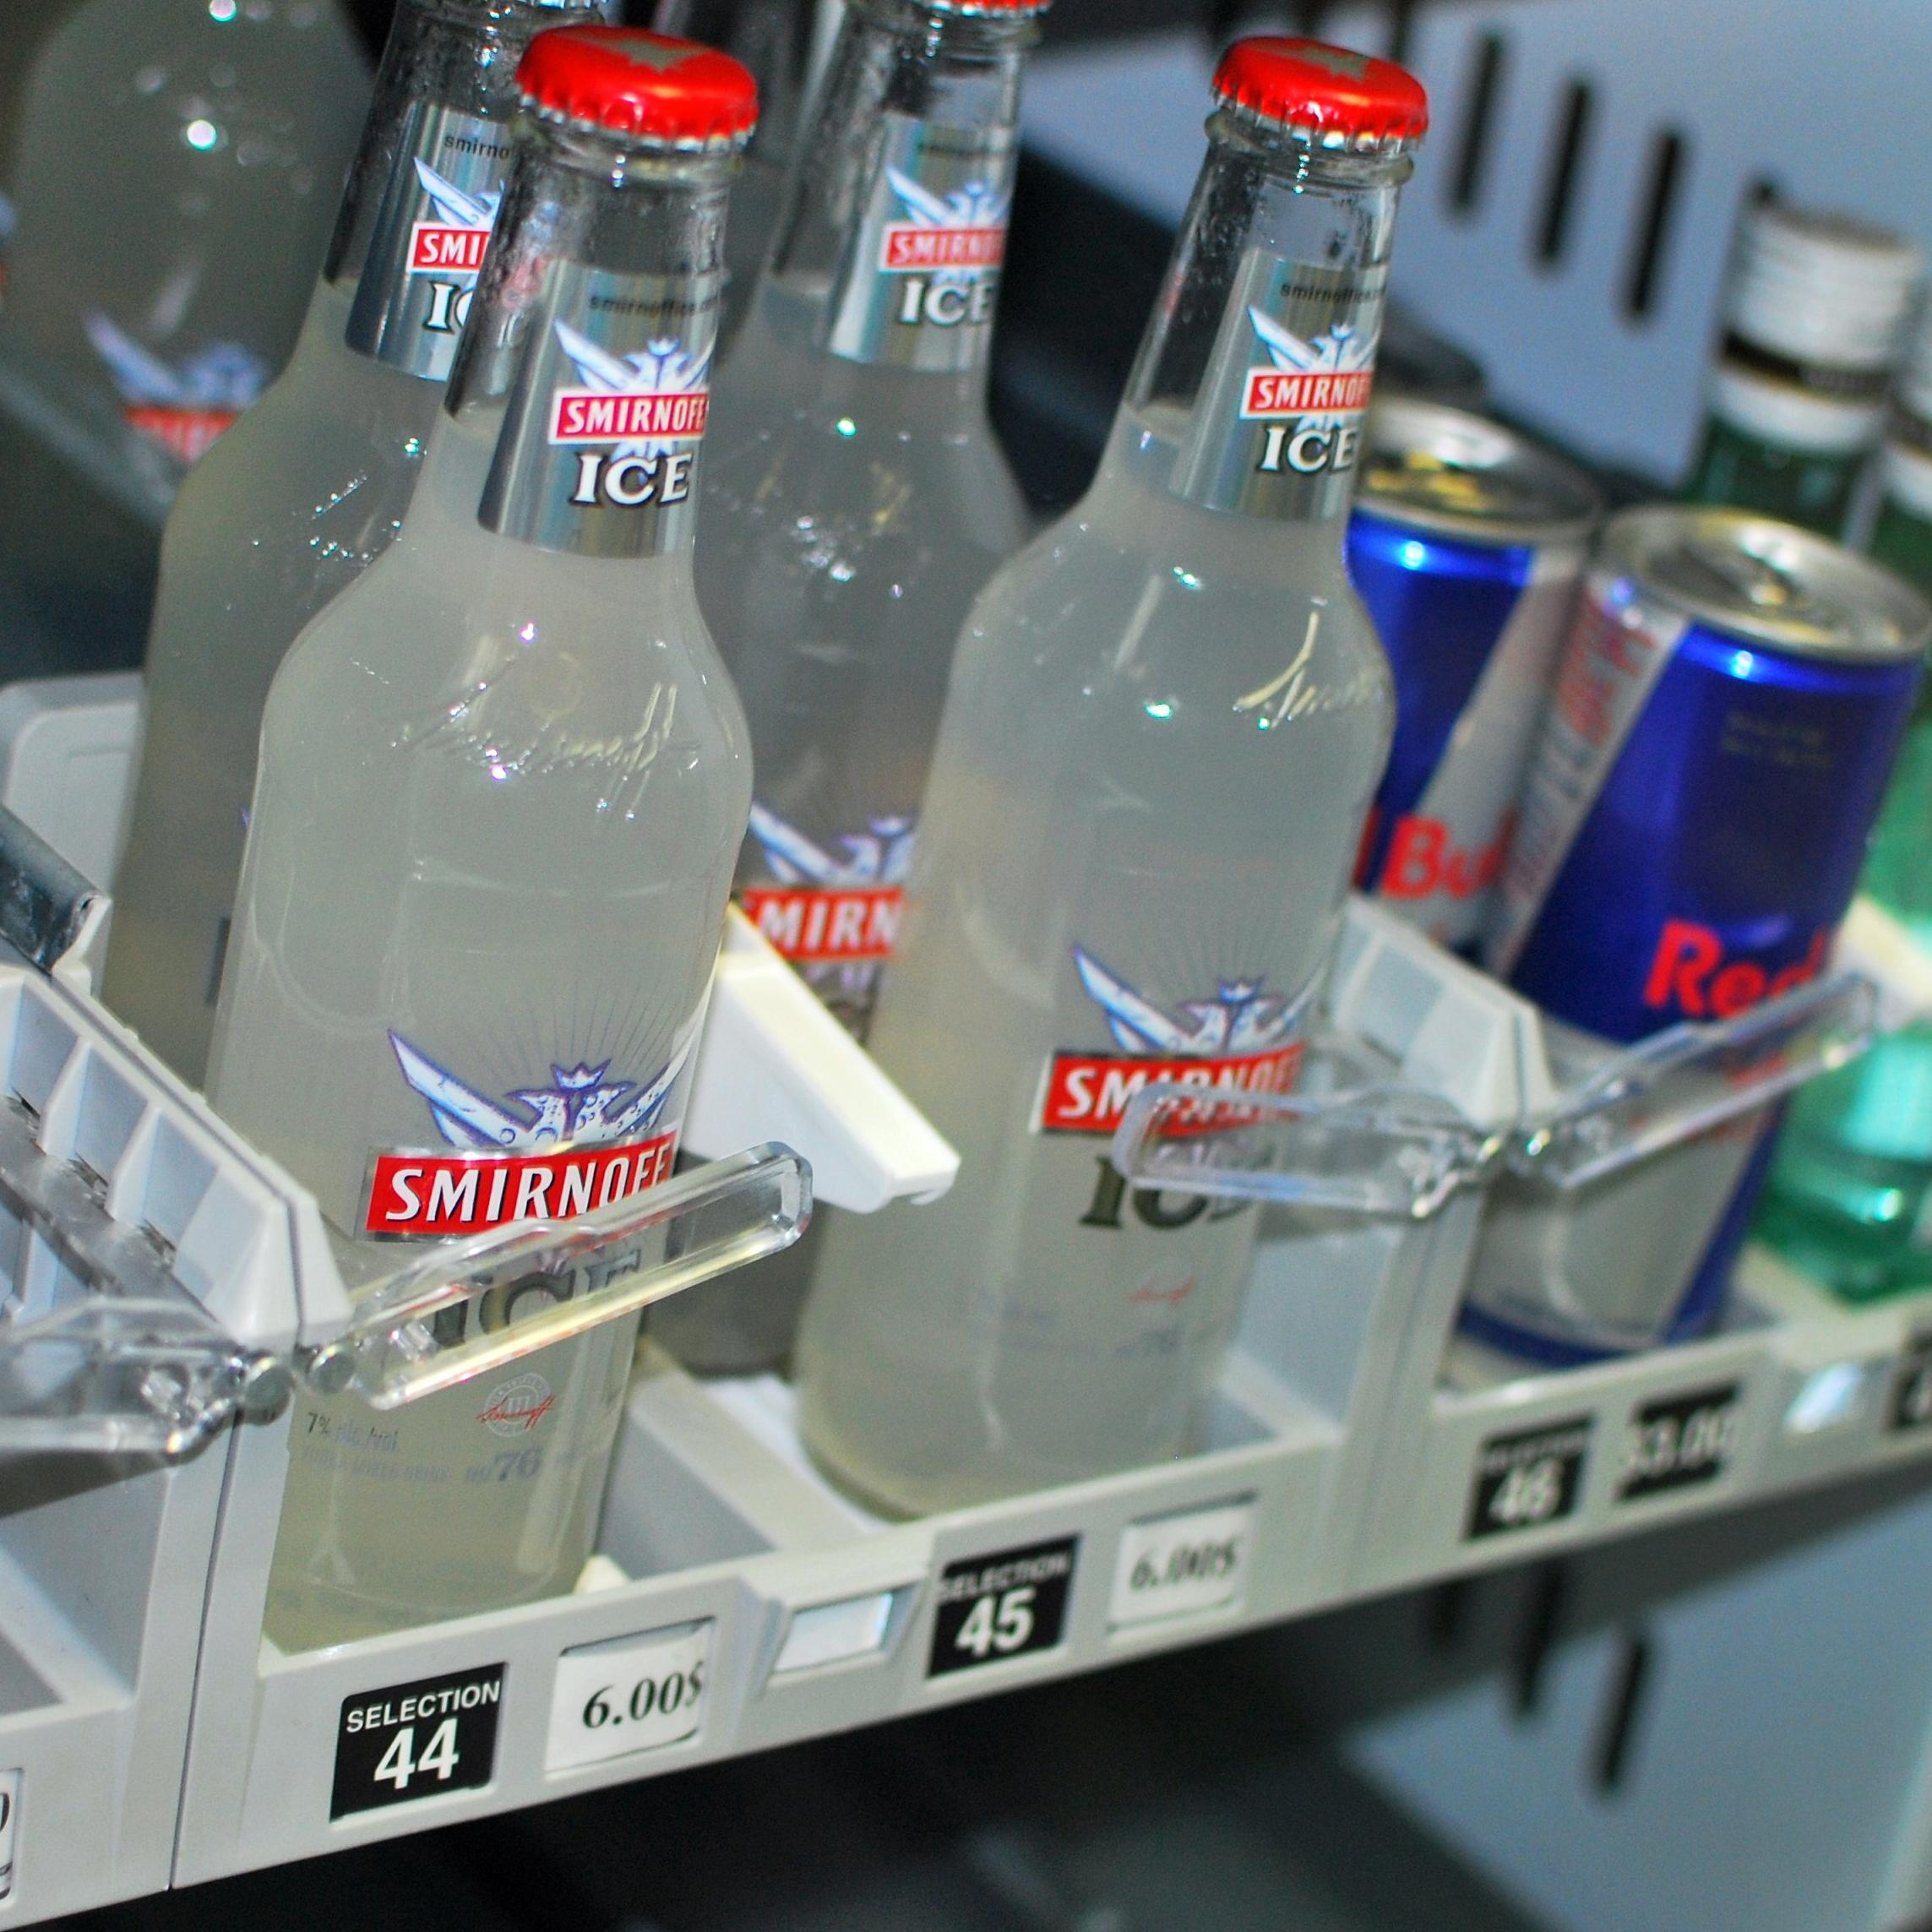 Smirnoff Ice malt beverages in sweet fruity flavors are popular among underage drinkers.